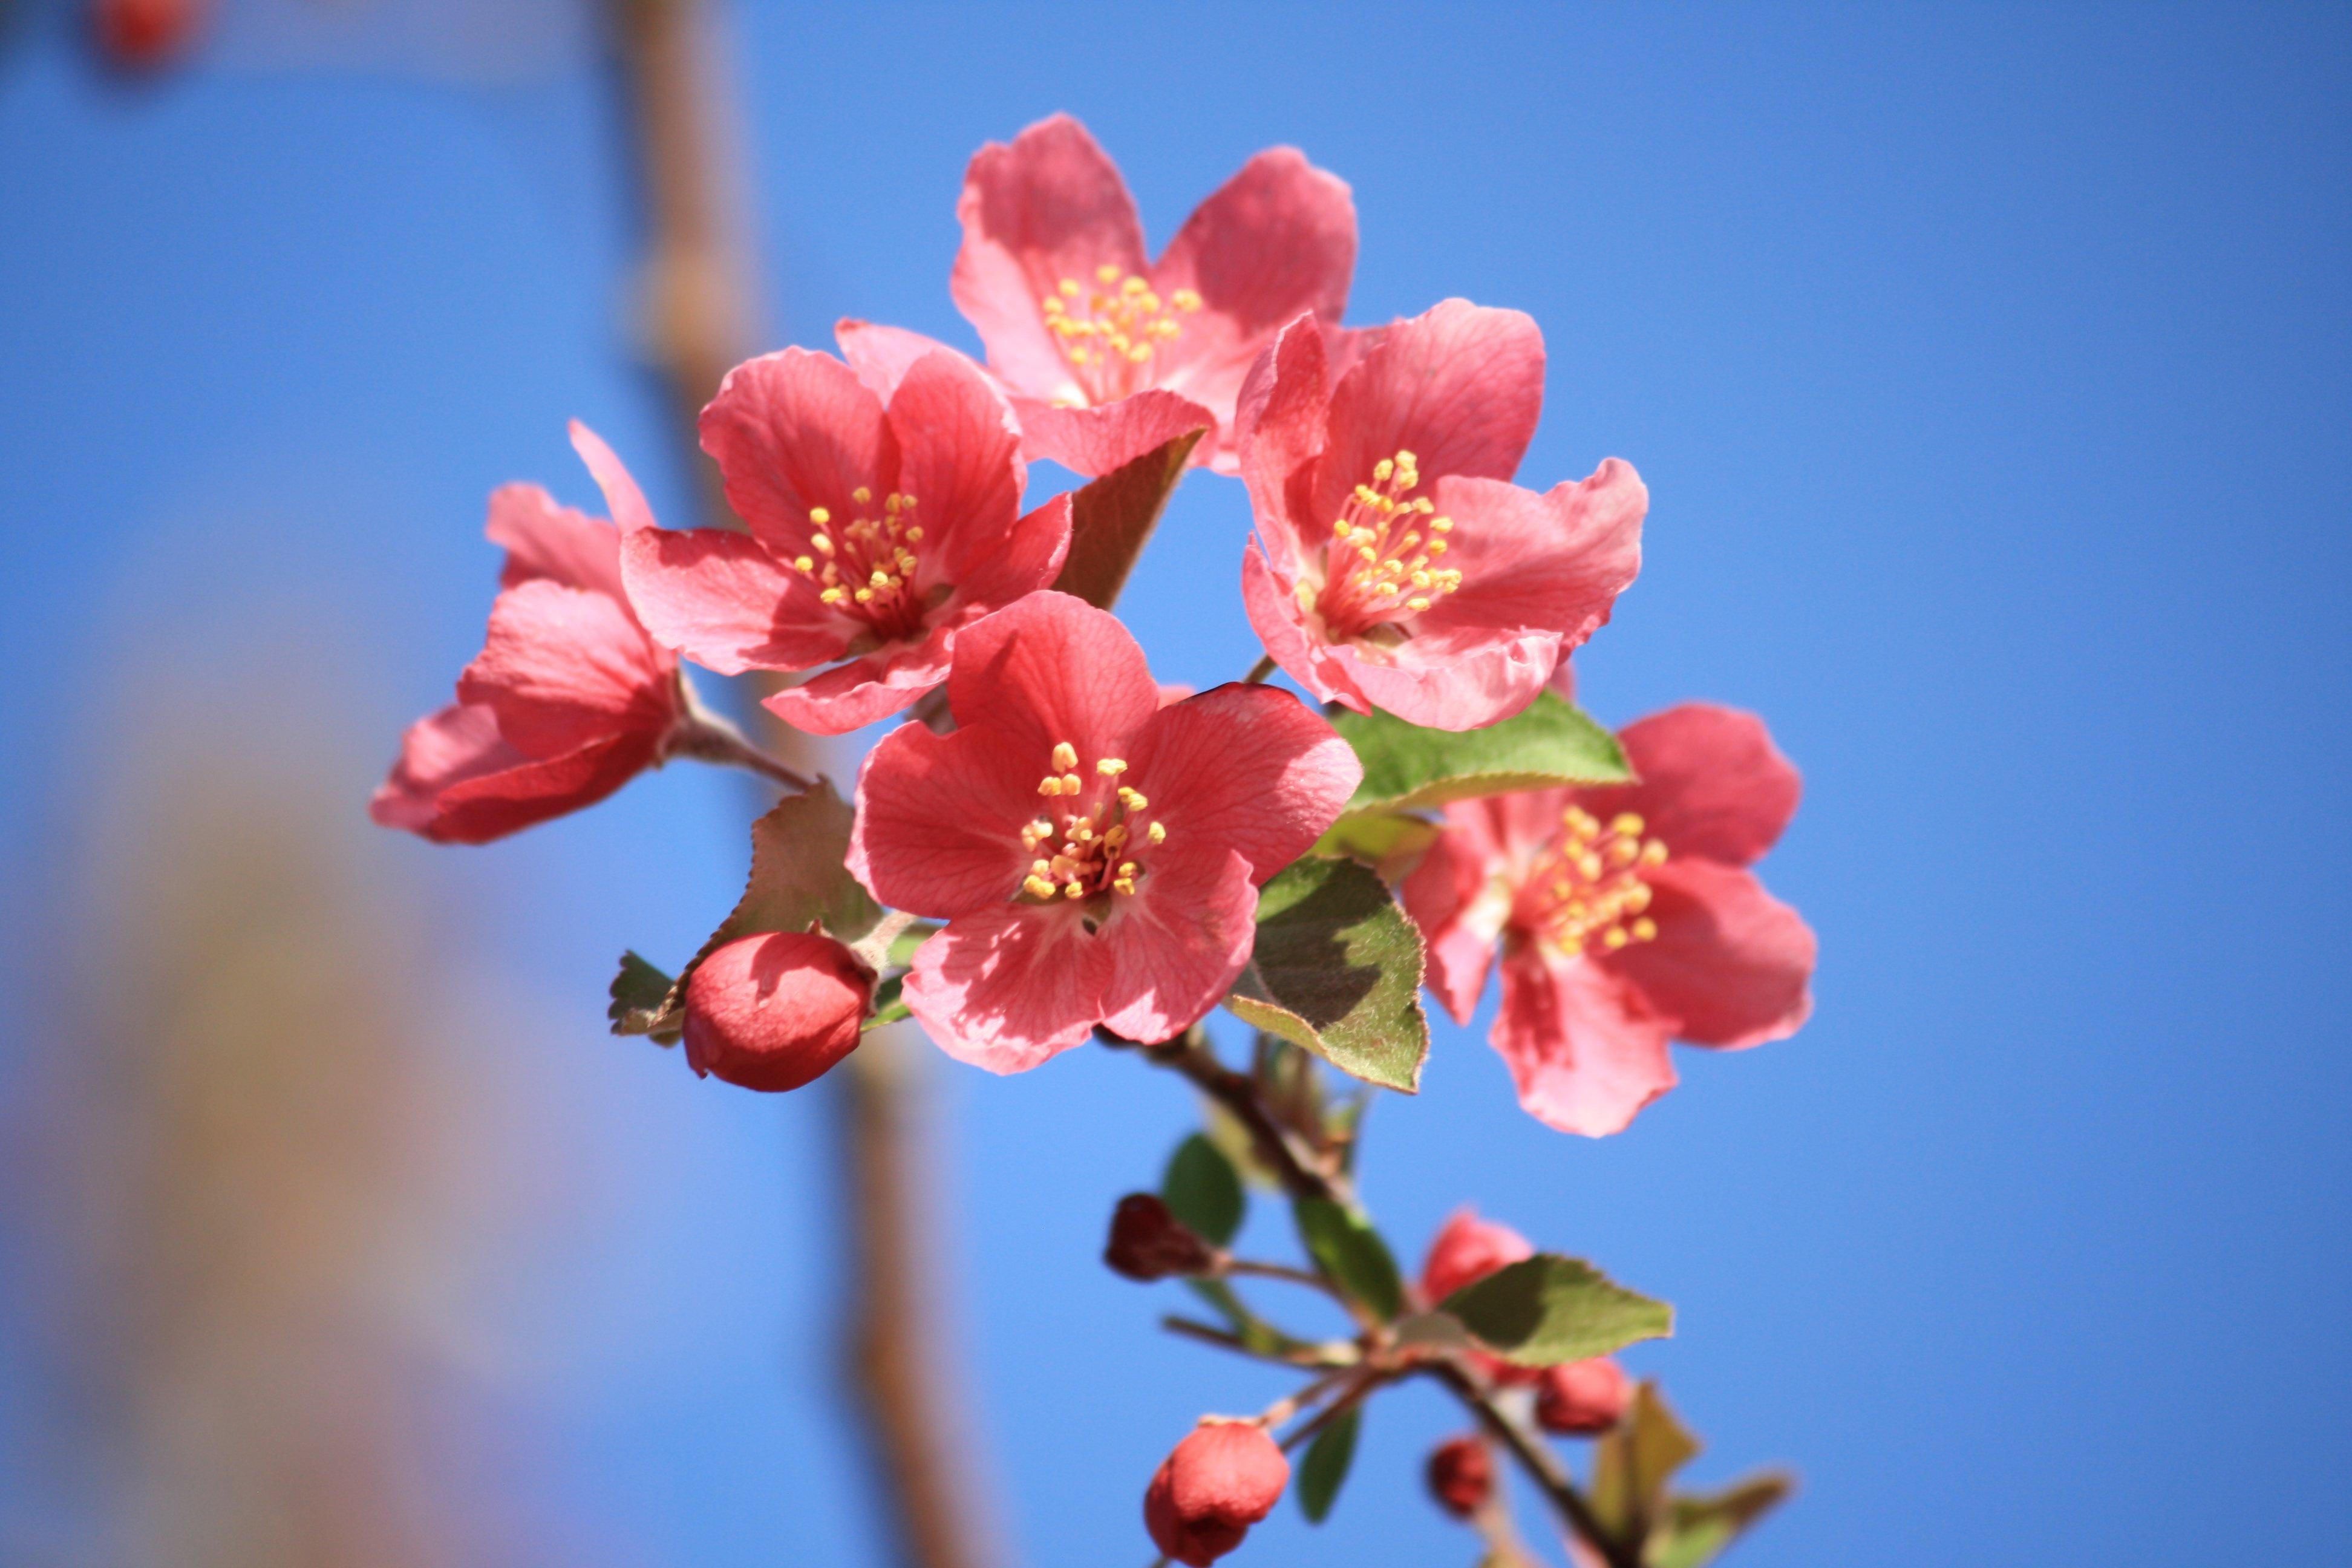 Salmon Pink Blossoms Picture | Free Photograph | Photos Public Domain